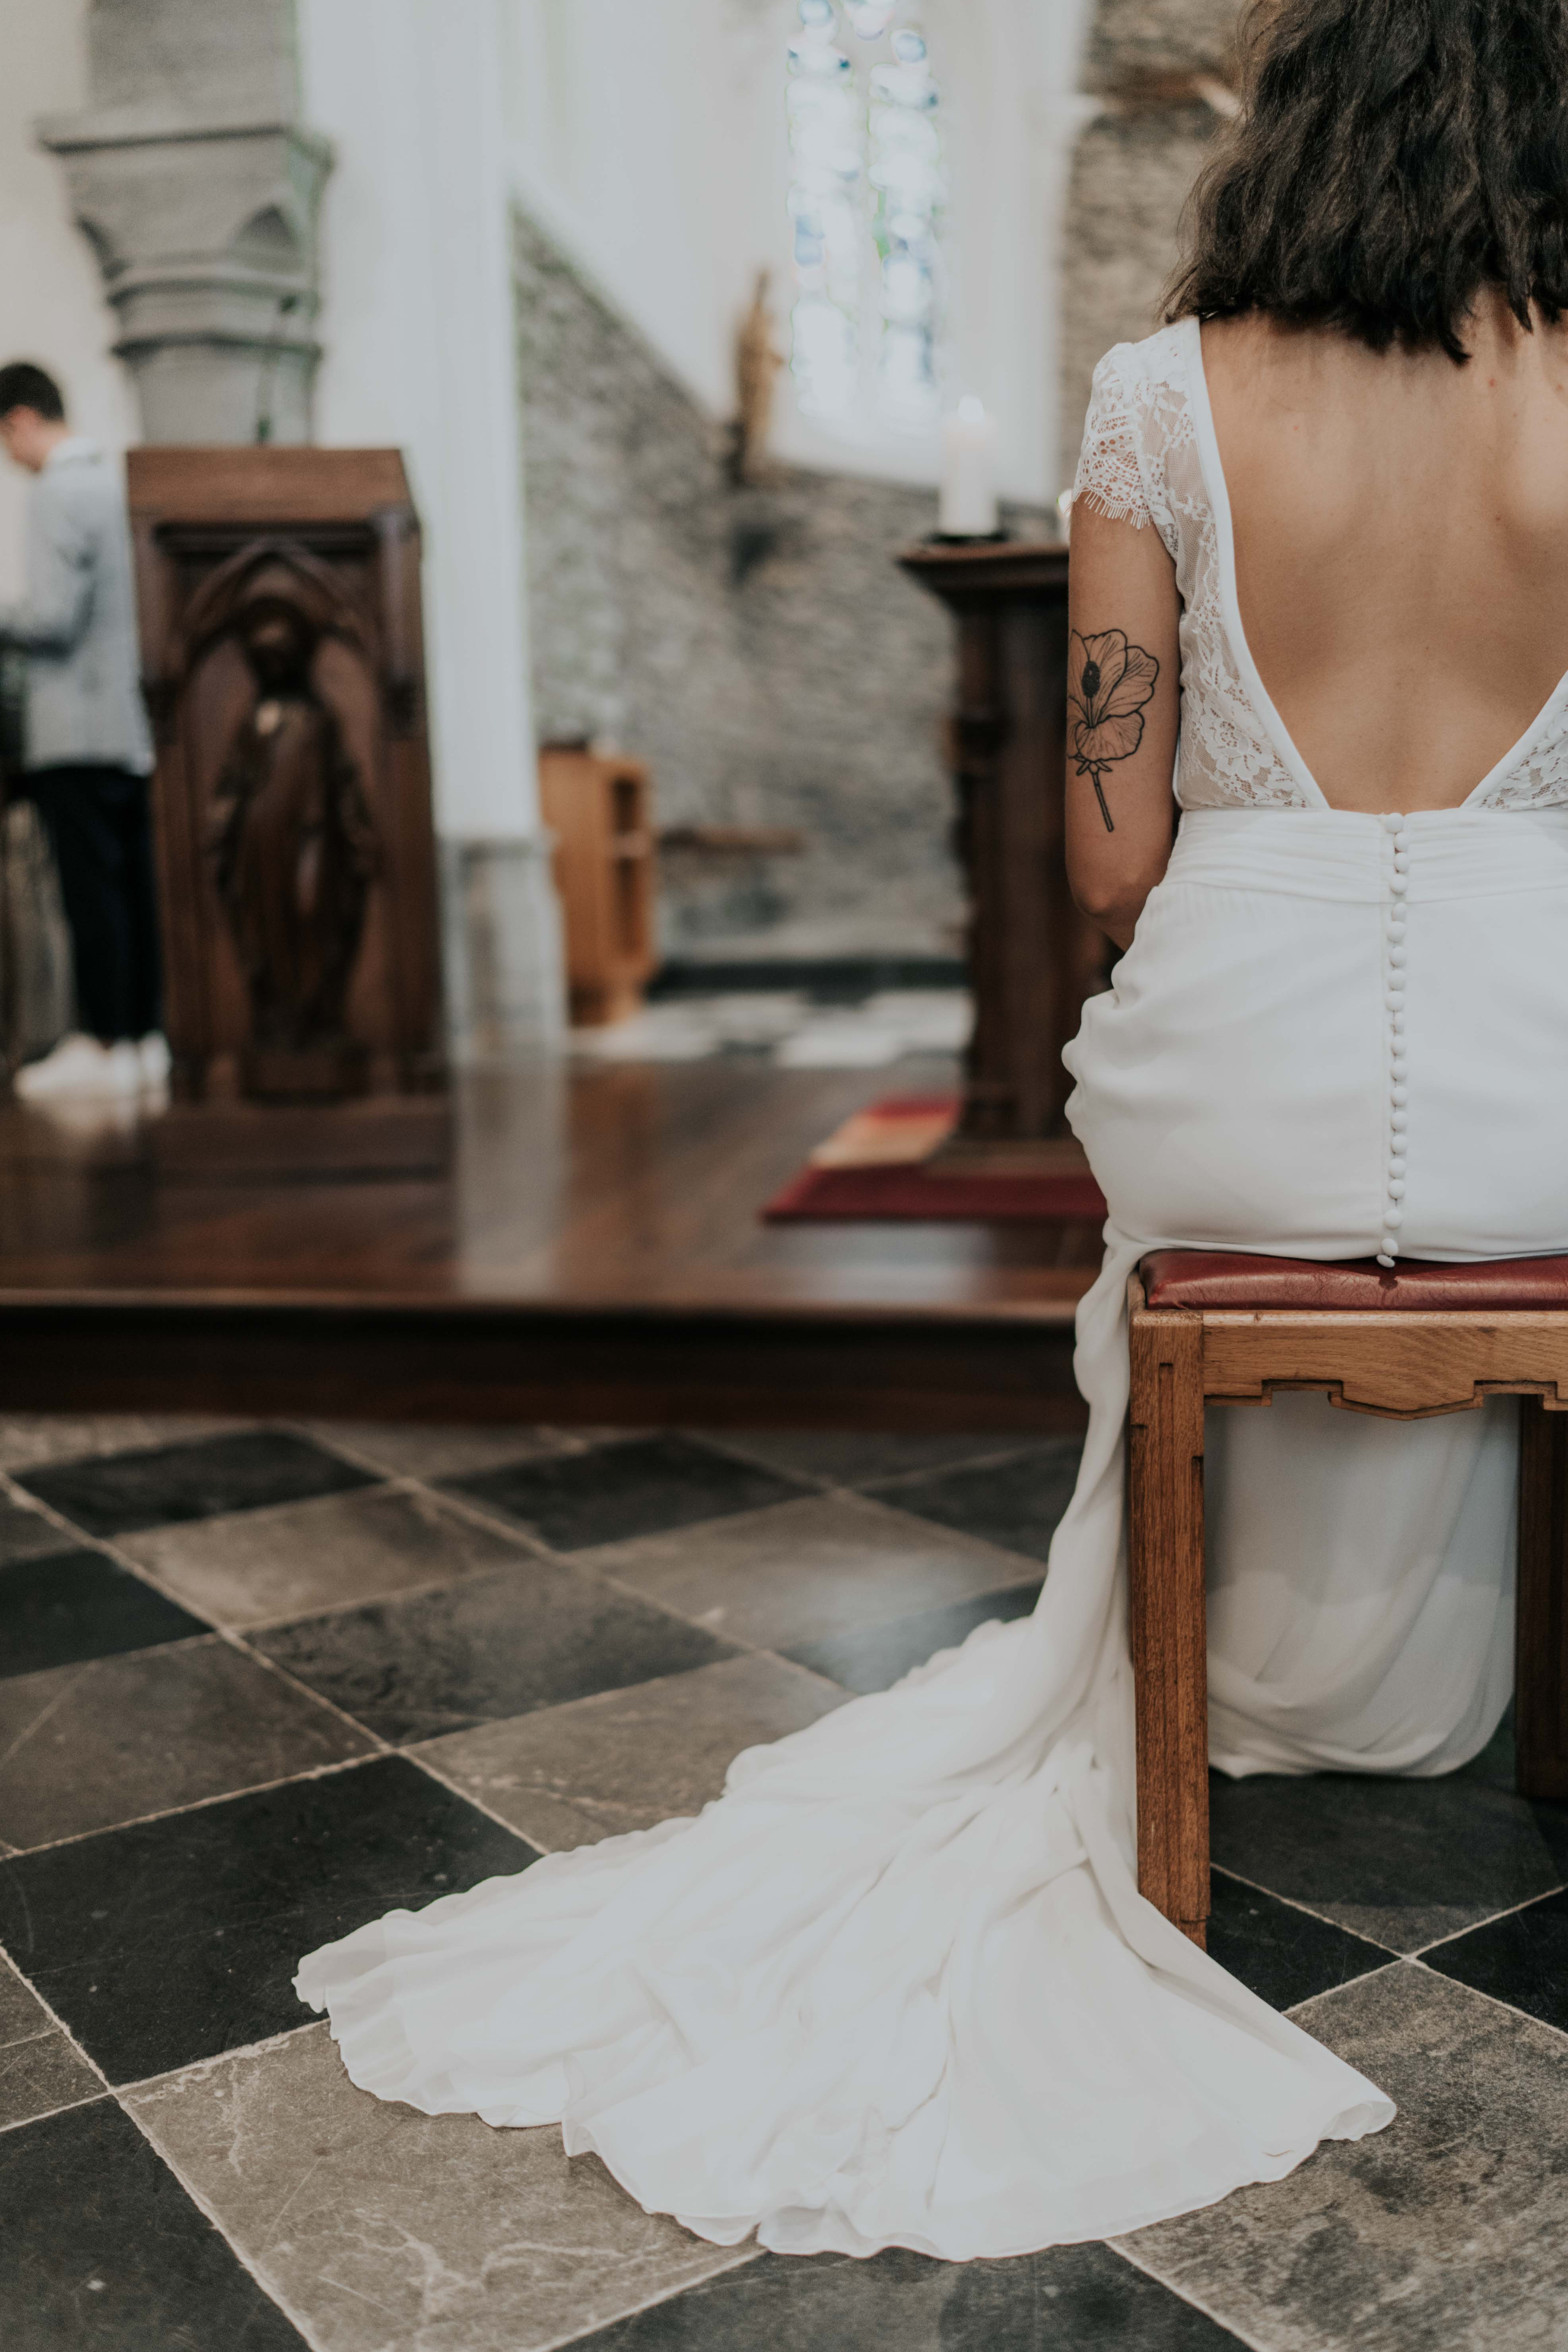 FANNY_MYARD_PHOTOGRAPHY_MARIAGE-4